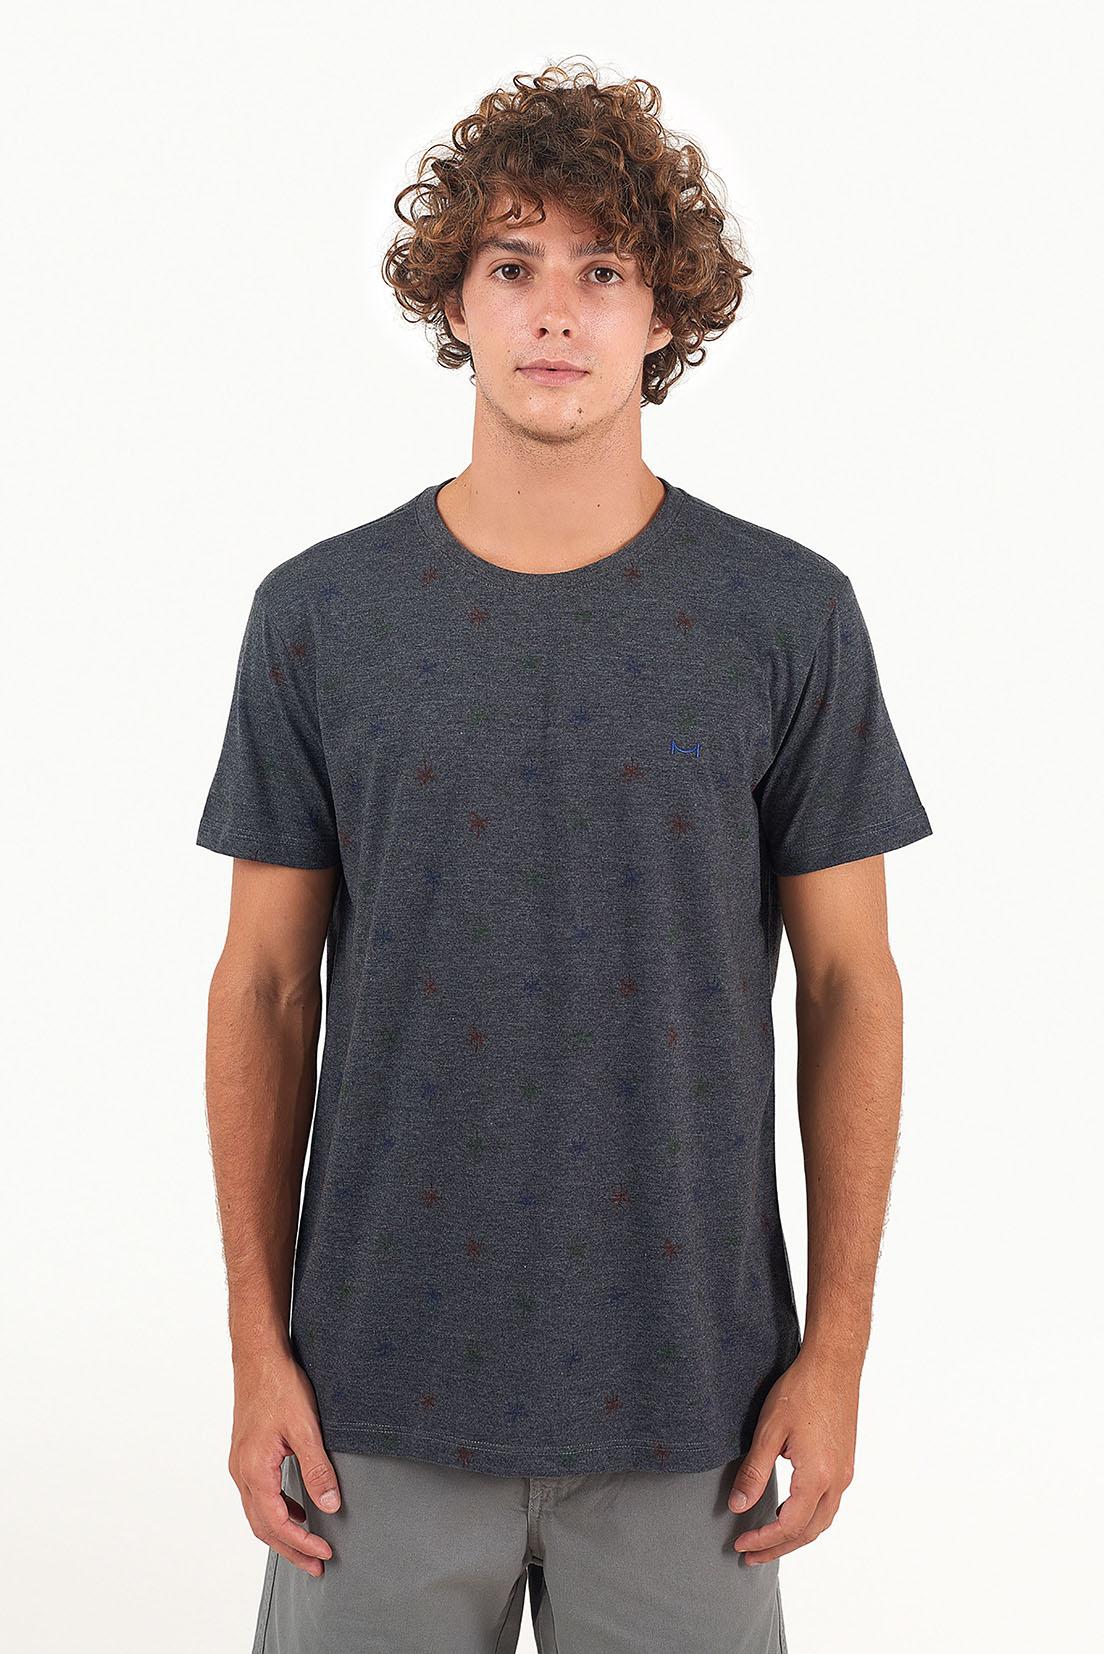 T-shirt Coqueiros melty